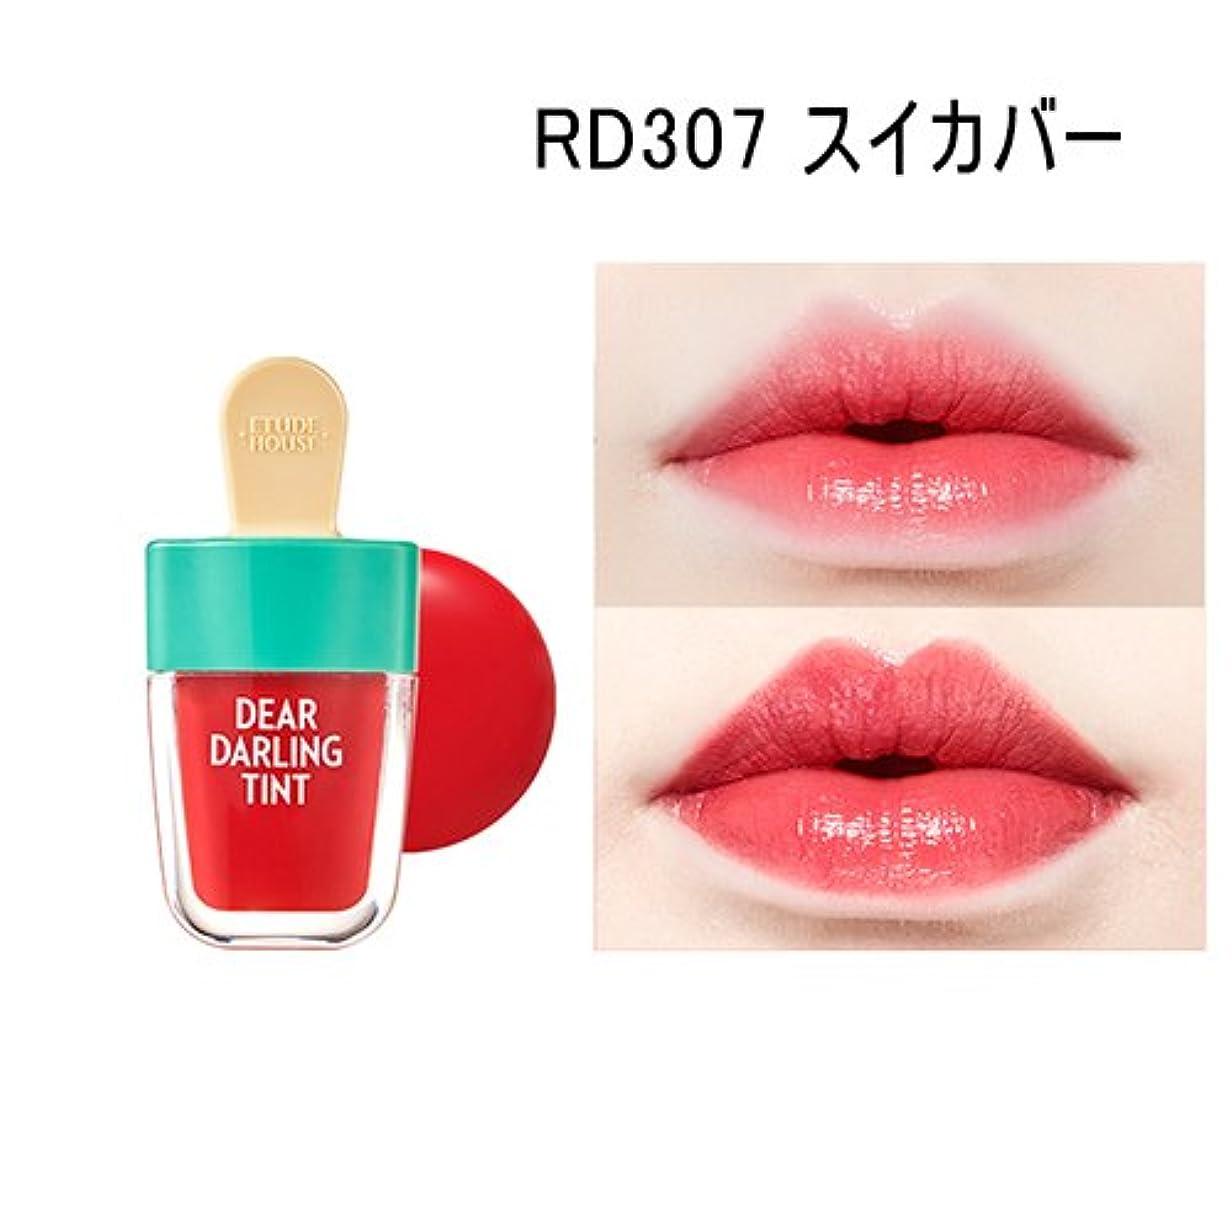 Etude House(エチュードハウス) [夏限定]ディアー ダーリン ウォータージェル ティント/Dear Darling Water Gel Tint(4.5g) (RD307(スイカレッド)) [並行輸入品]